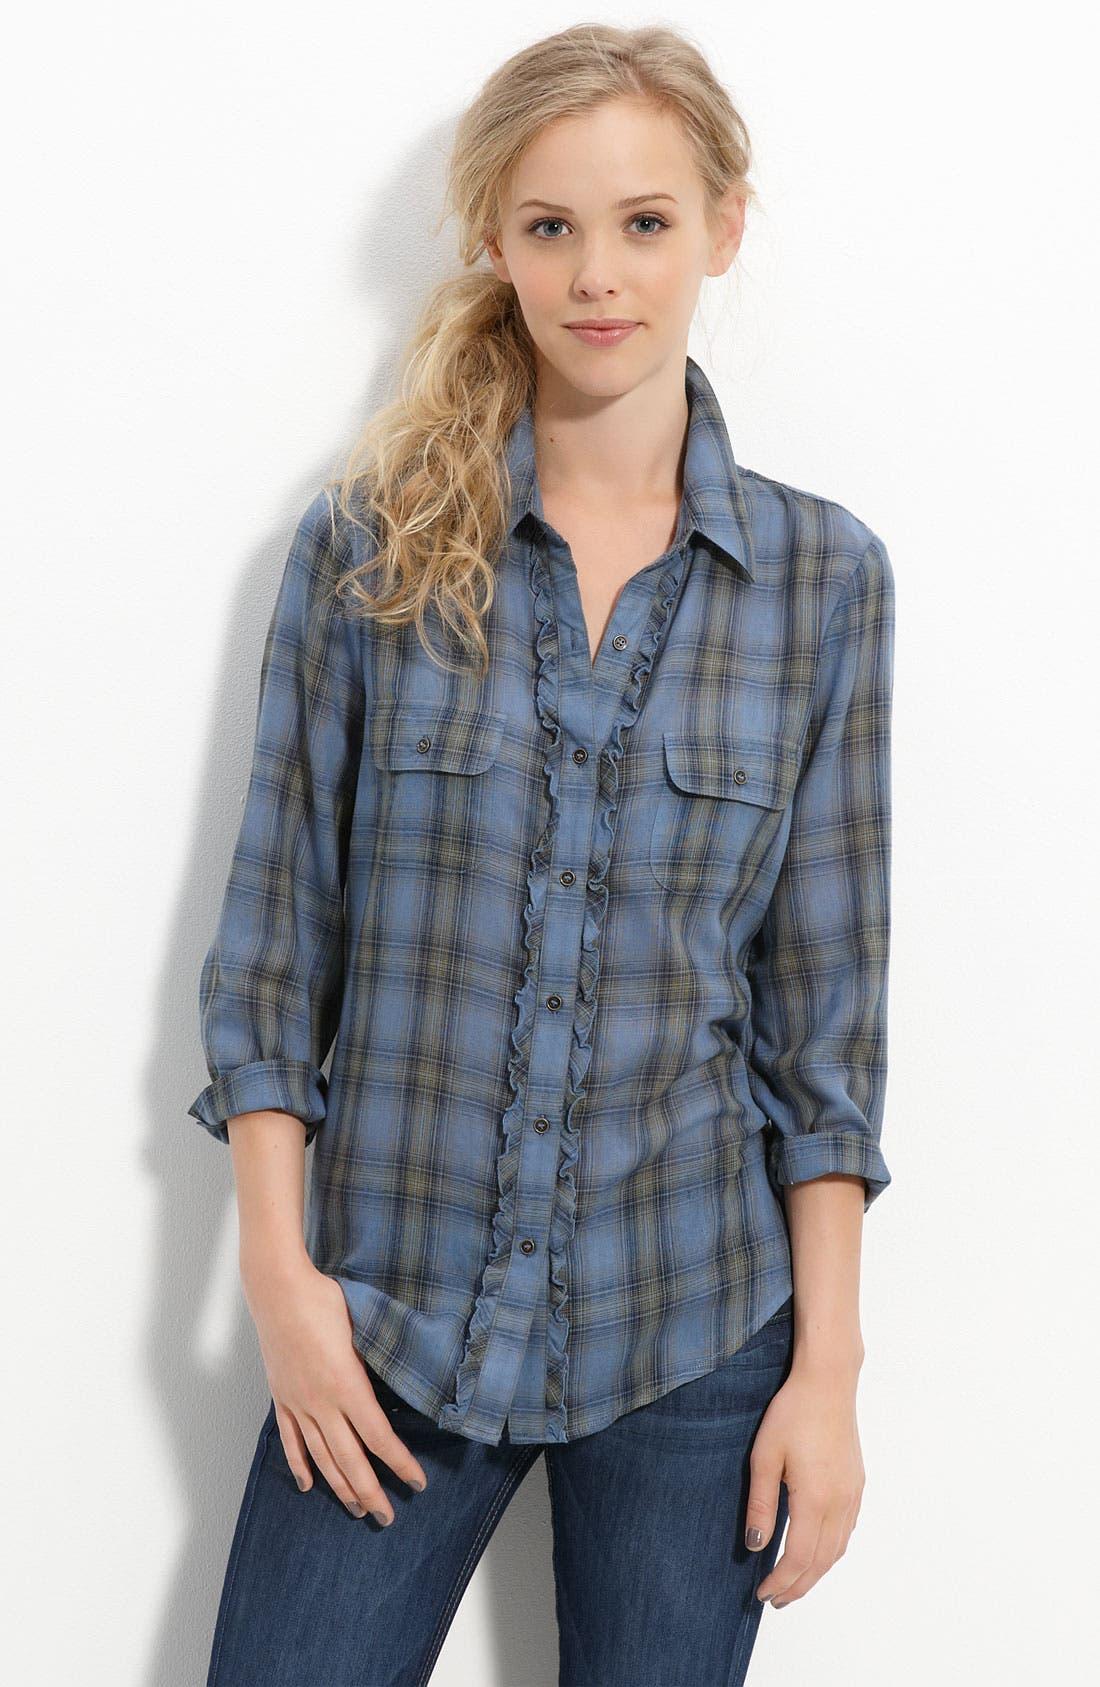 Alternate Image 1 Selected - Love on a Hanger Ruffled Plaid Shirt (Juniors)